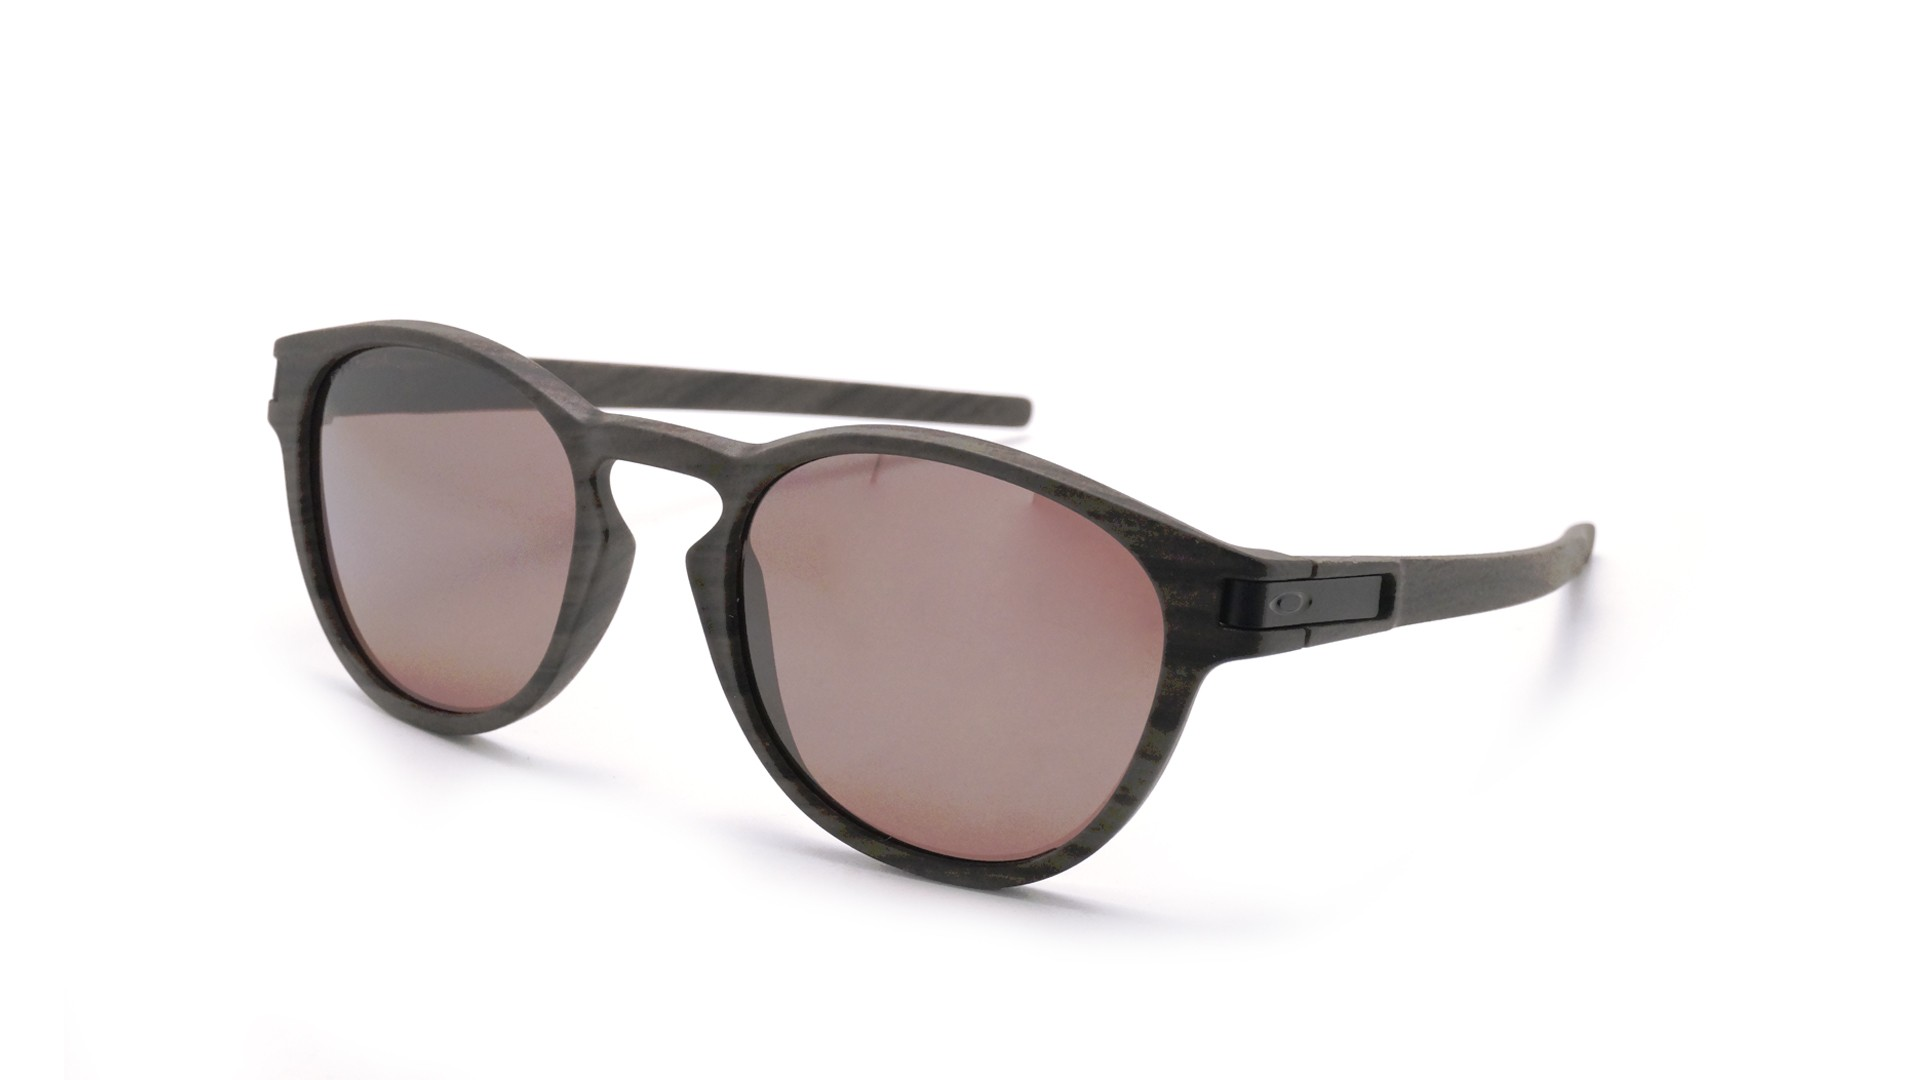 80e016c728 Sunglasses Oakley Latch Woodgrain Brown Matte OO9265 12 53-21 Medium  Polarized